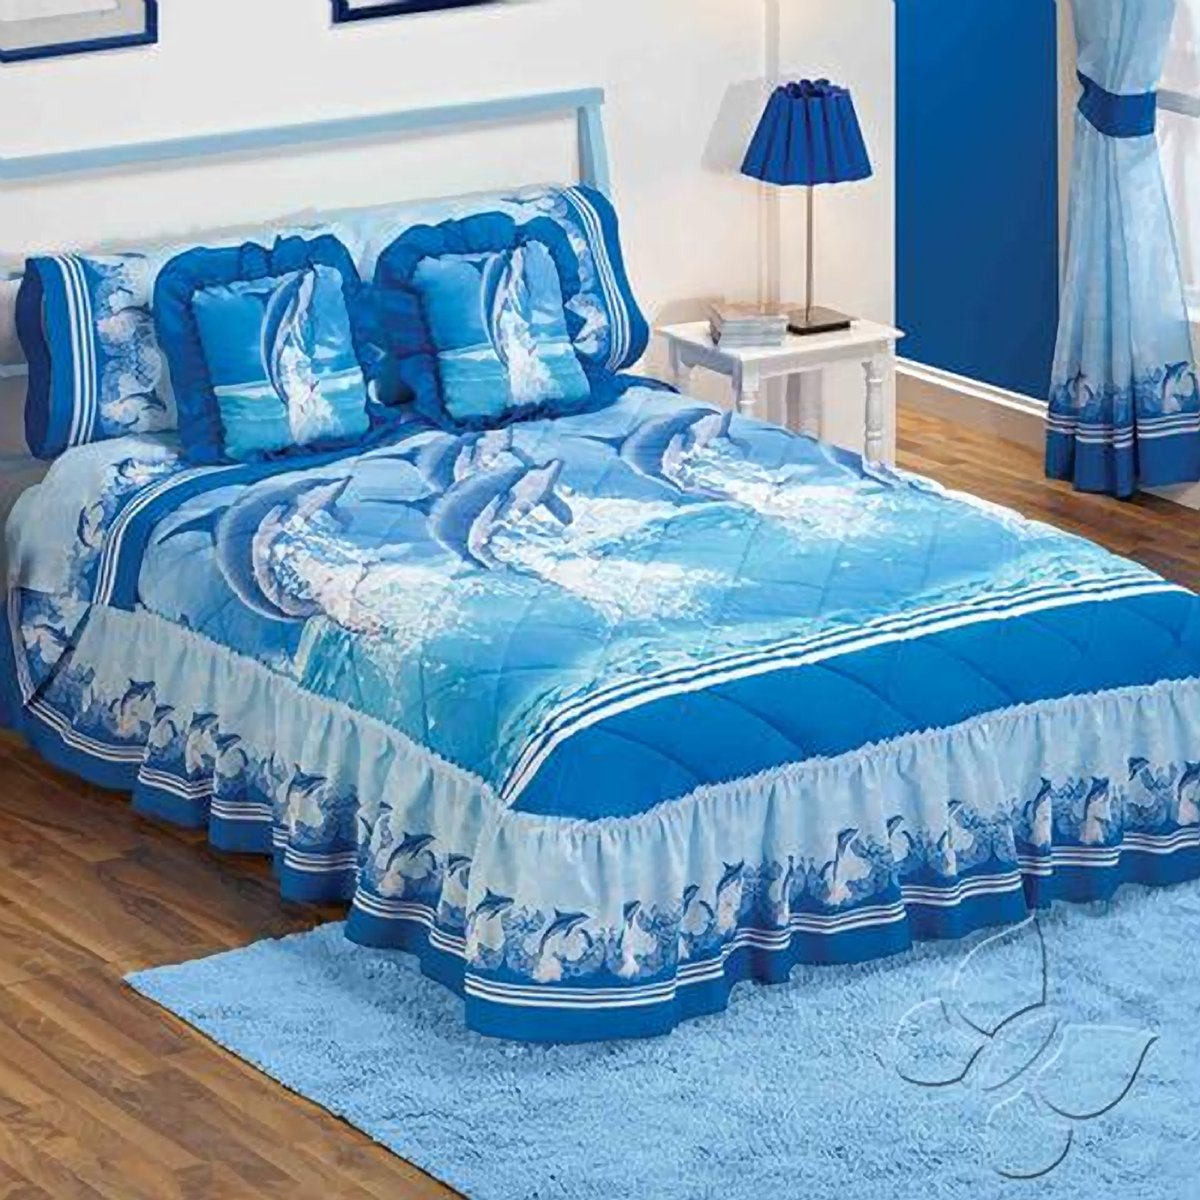 Amazon.com: Blue Sea Dolphins Bedspread Sheets Bedding Set Queen: Home U0026  Kitchen